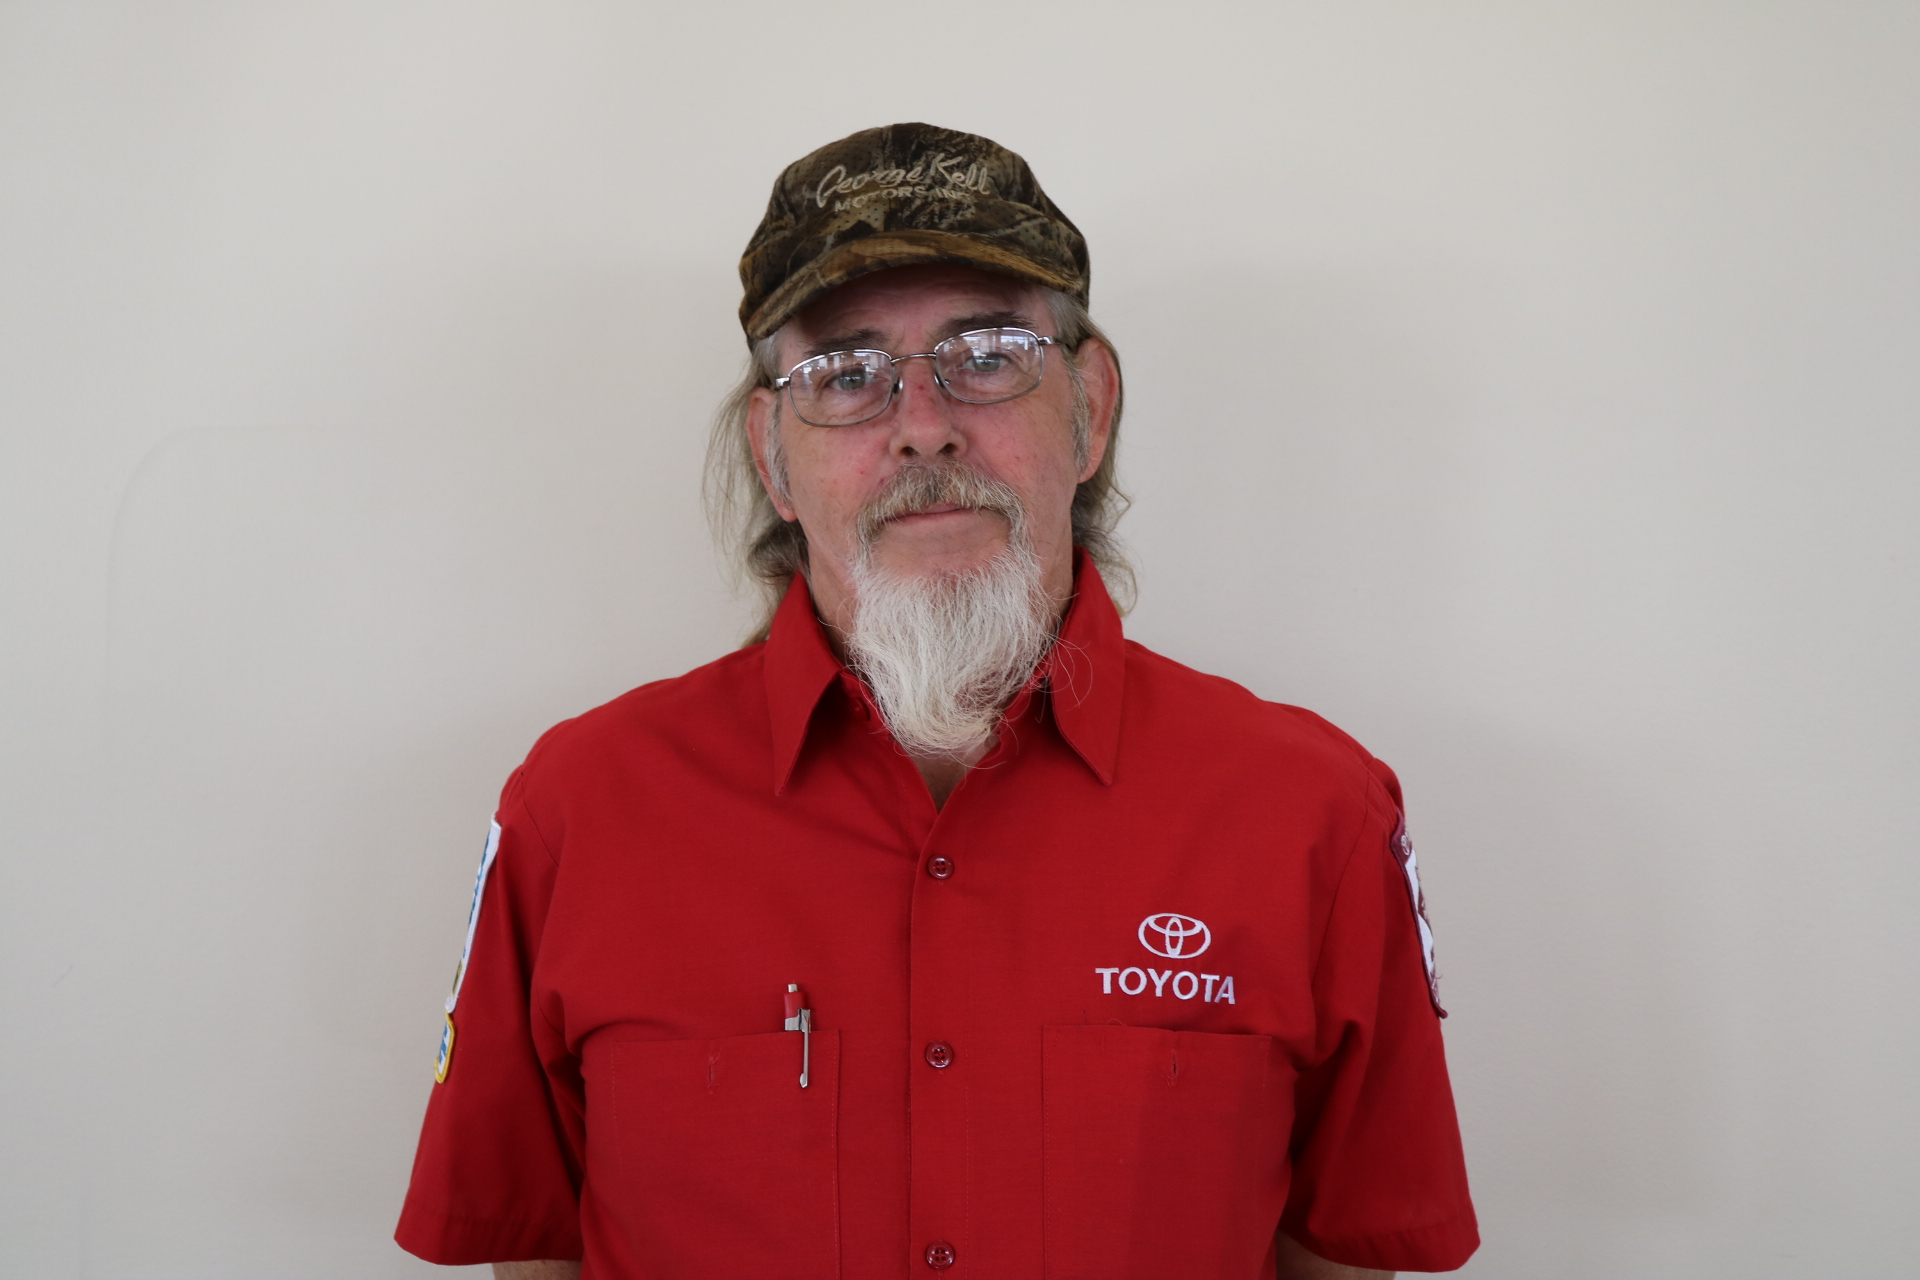 Michael Driver